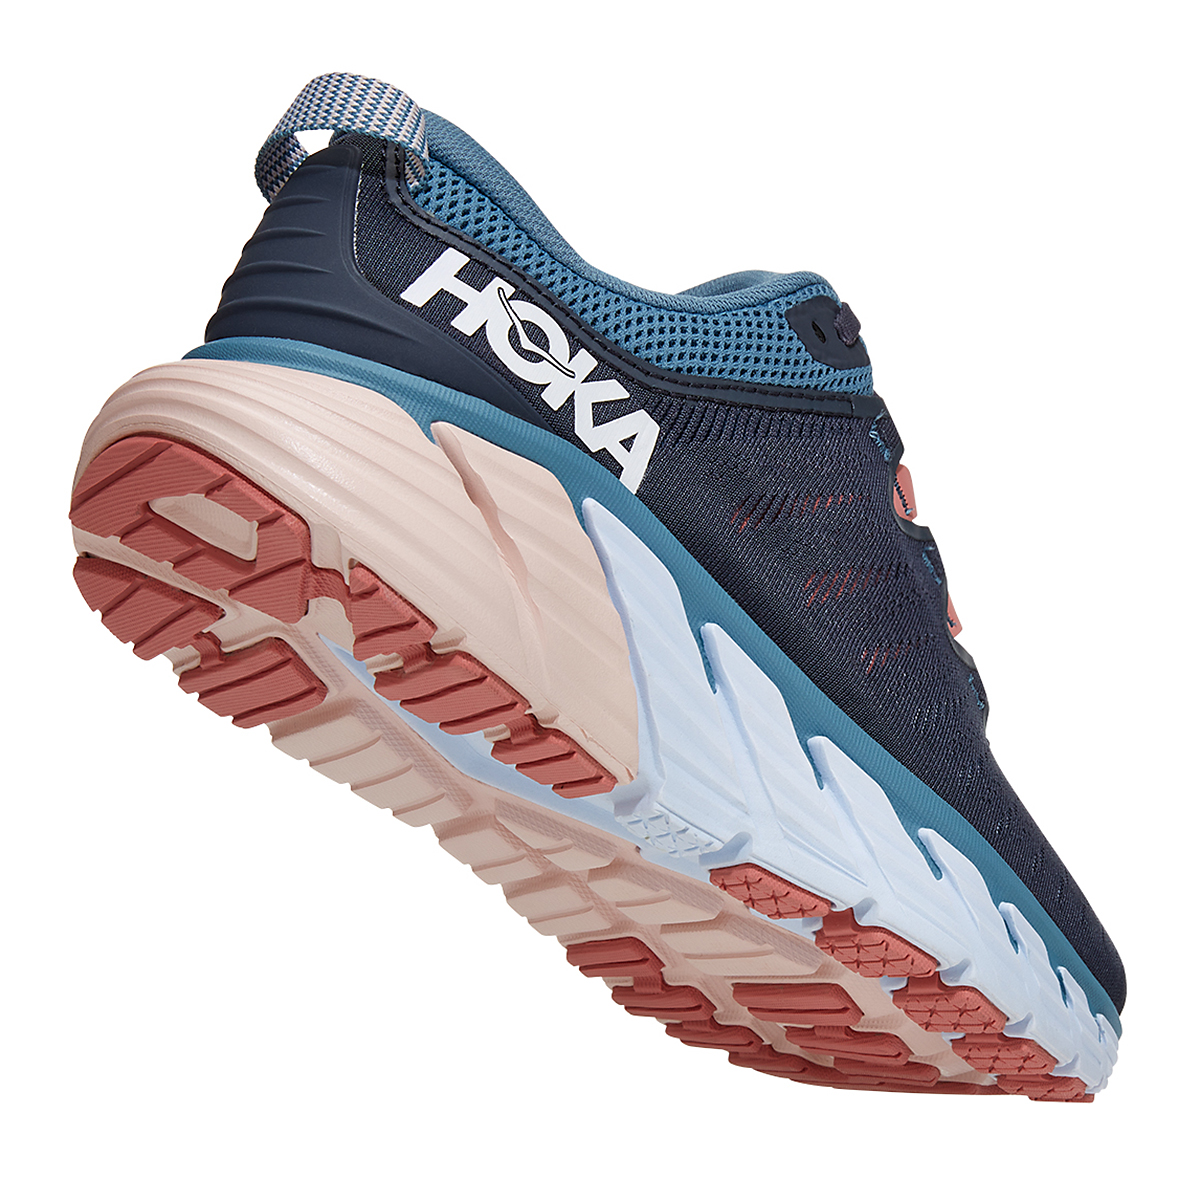 Women's Hoka One One Gaviota 3 Running Shoe - Color: Ombre Blue/Rosette - Size: 5 - Width: Regular, Ombre Blue/Rosette, large, image 3